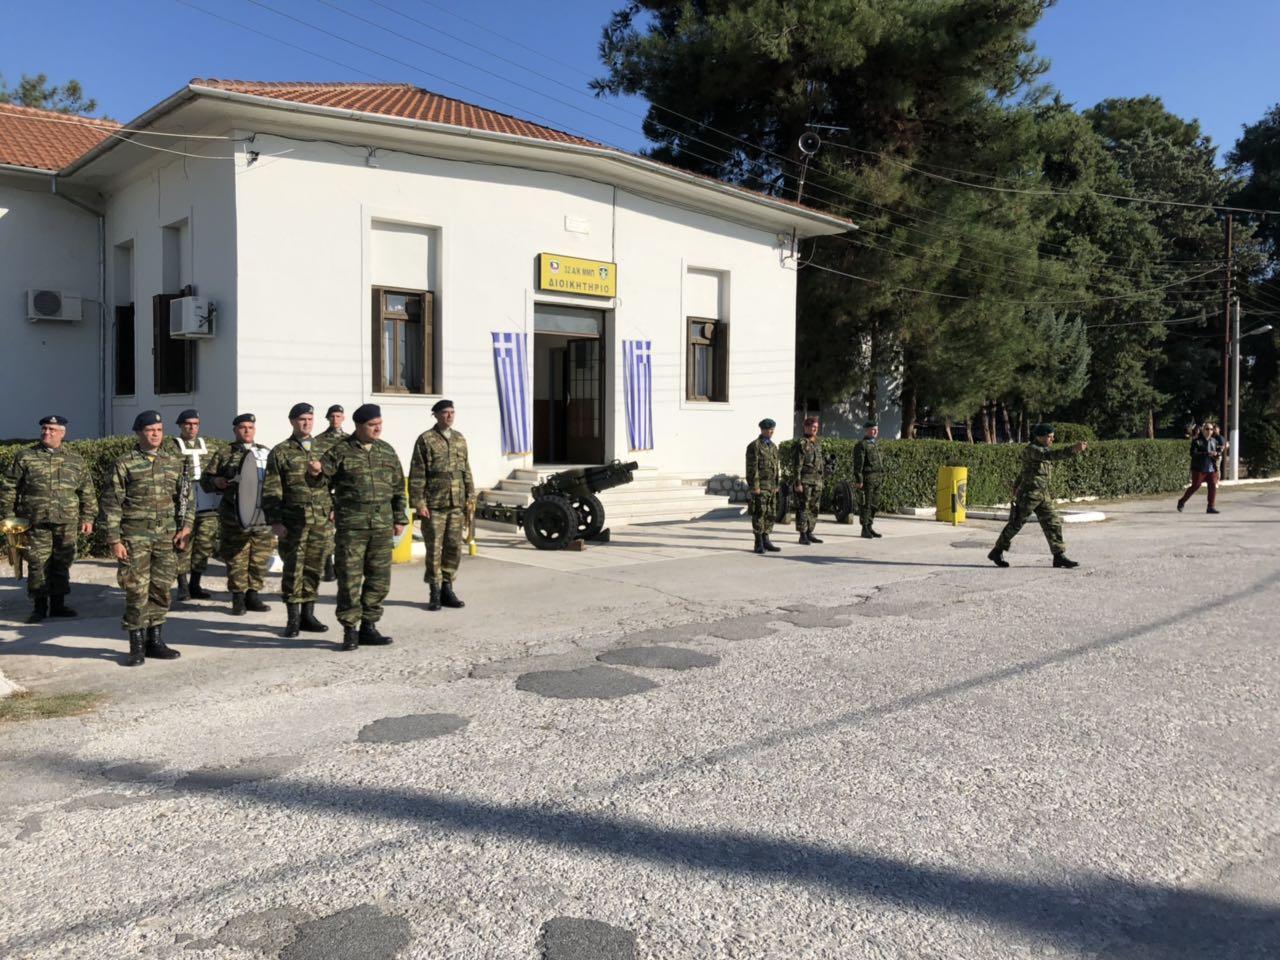 "orkomosia mpouga 5 - Στην ορκωμοσία νέων οπλιτών στο Στρατόπεδο ""Μπουγά"" ο Σεβασμιώτατος"